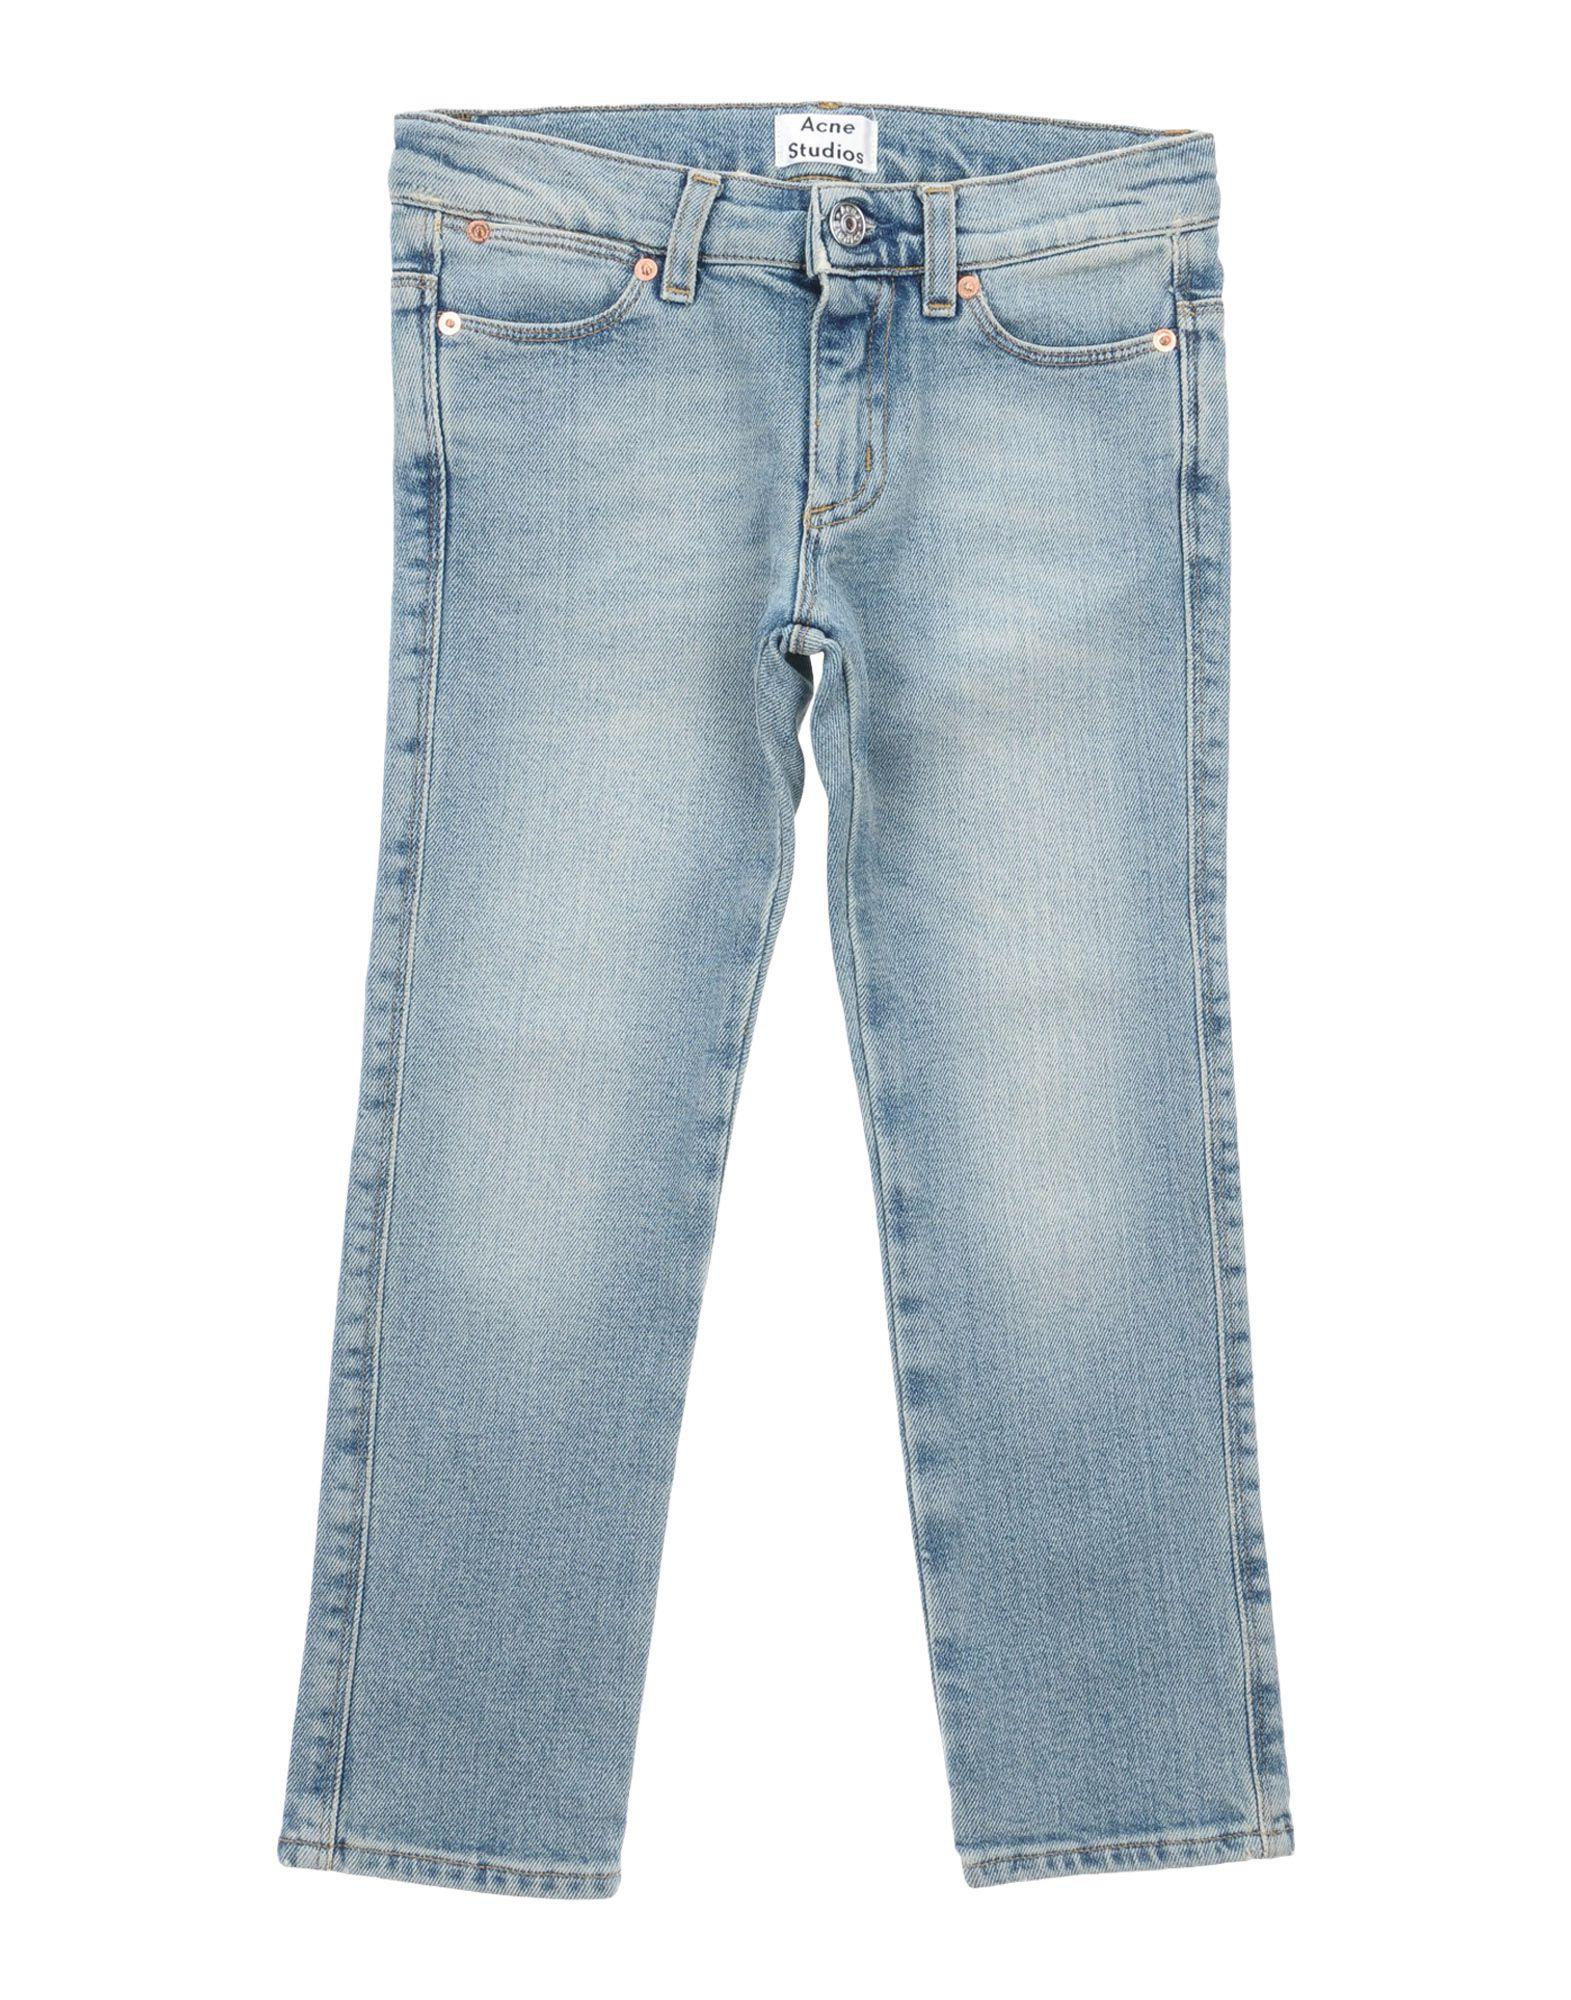 ACNE STUDIOS Jungen 3-8 jahre Jeanshose Farbe Blau Größe 6